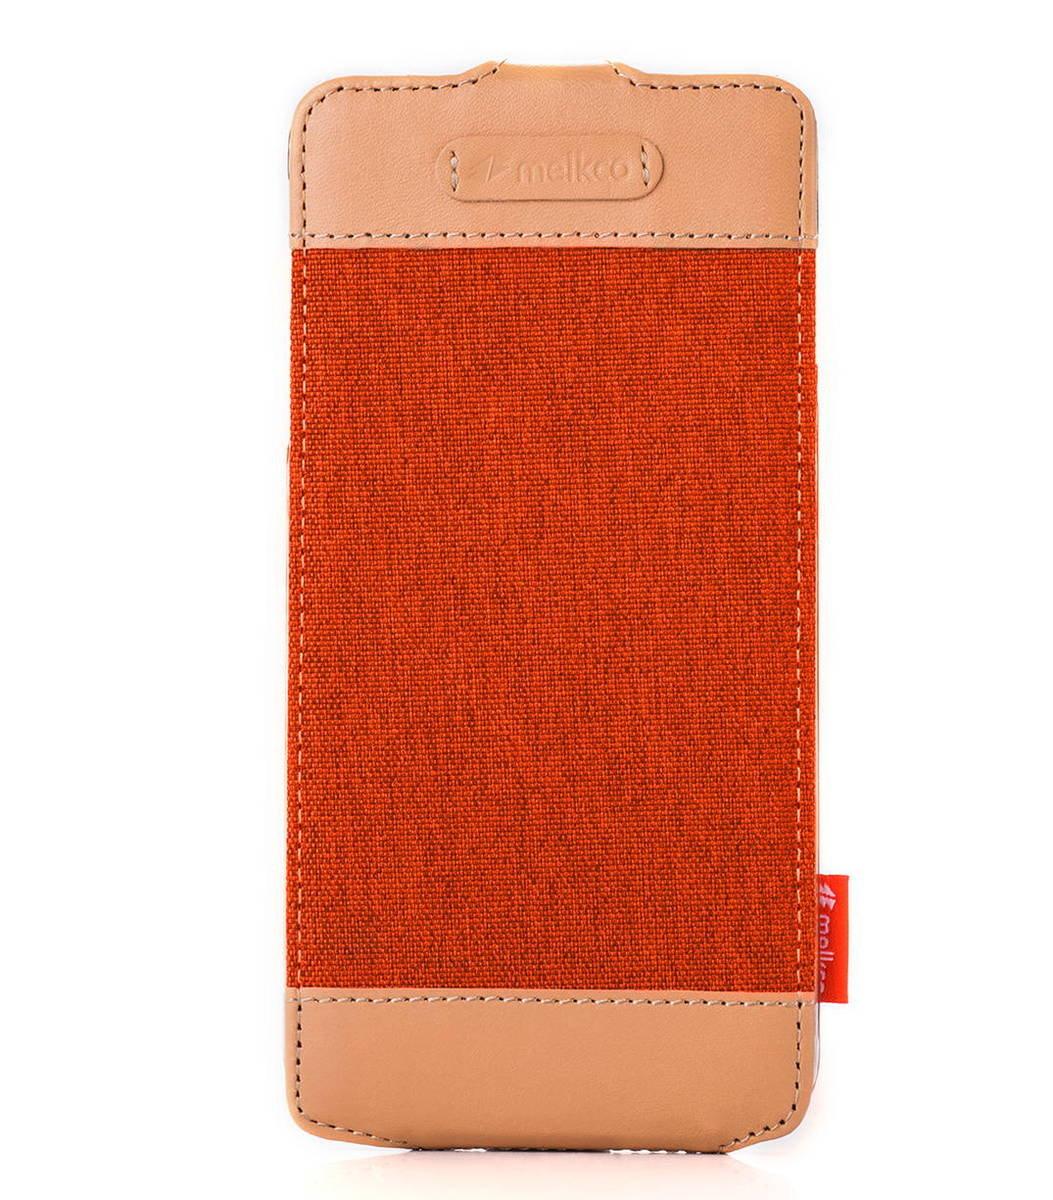 "Apple Iphone 6 Plus/6s Plus (5.5"") Jacka Type Cru系列高級時尚真皮手機套(橙色)"